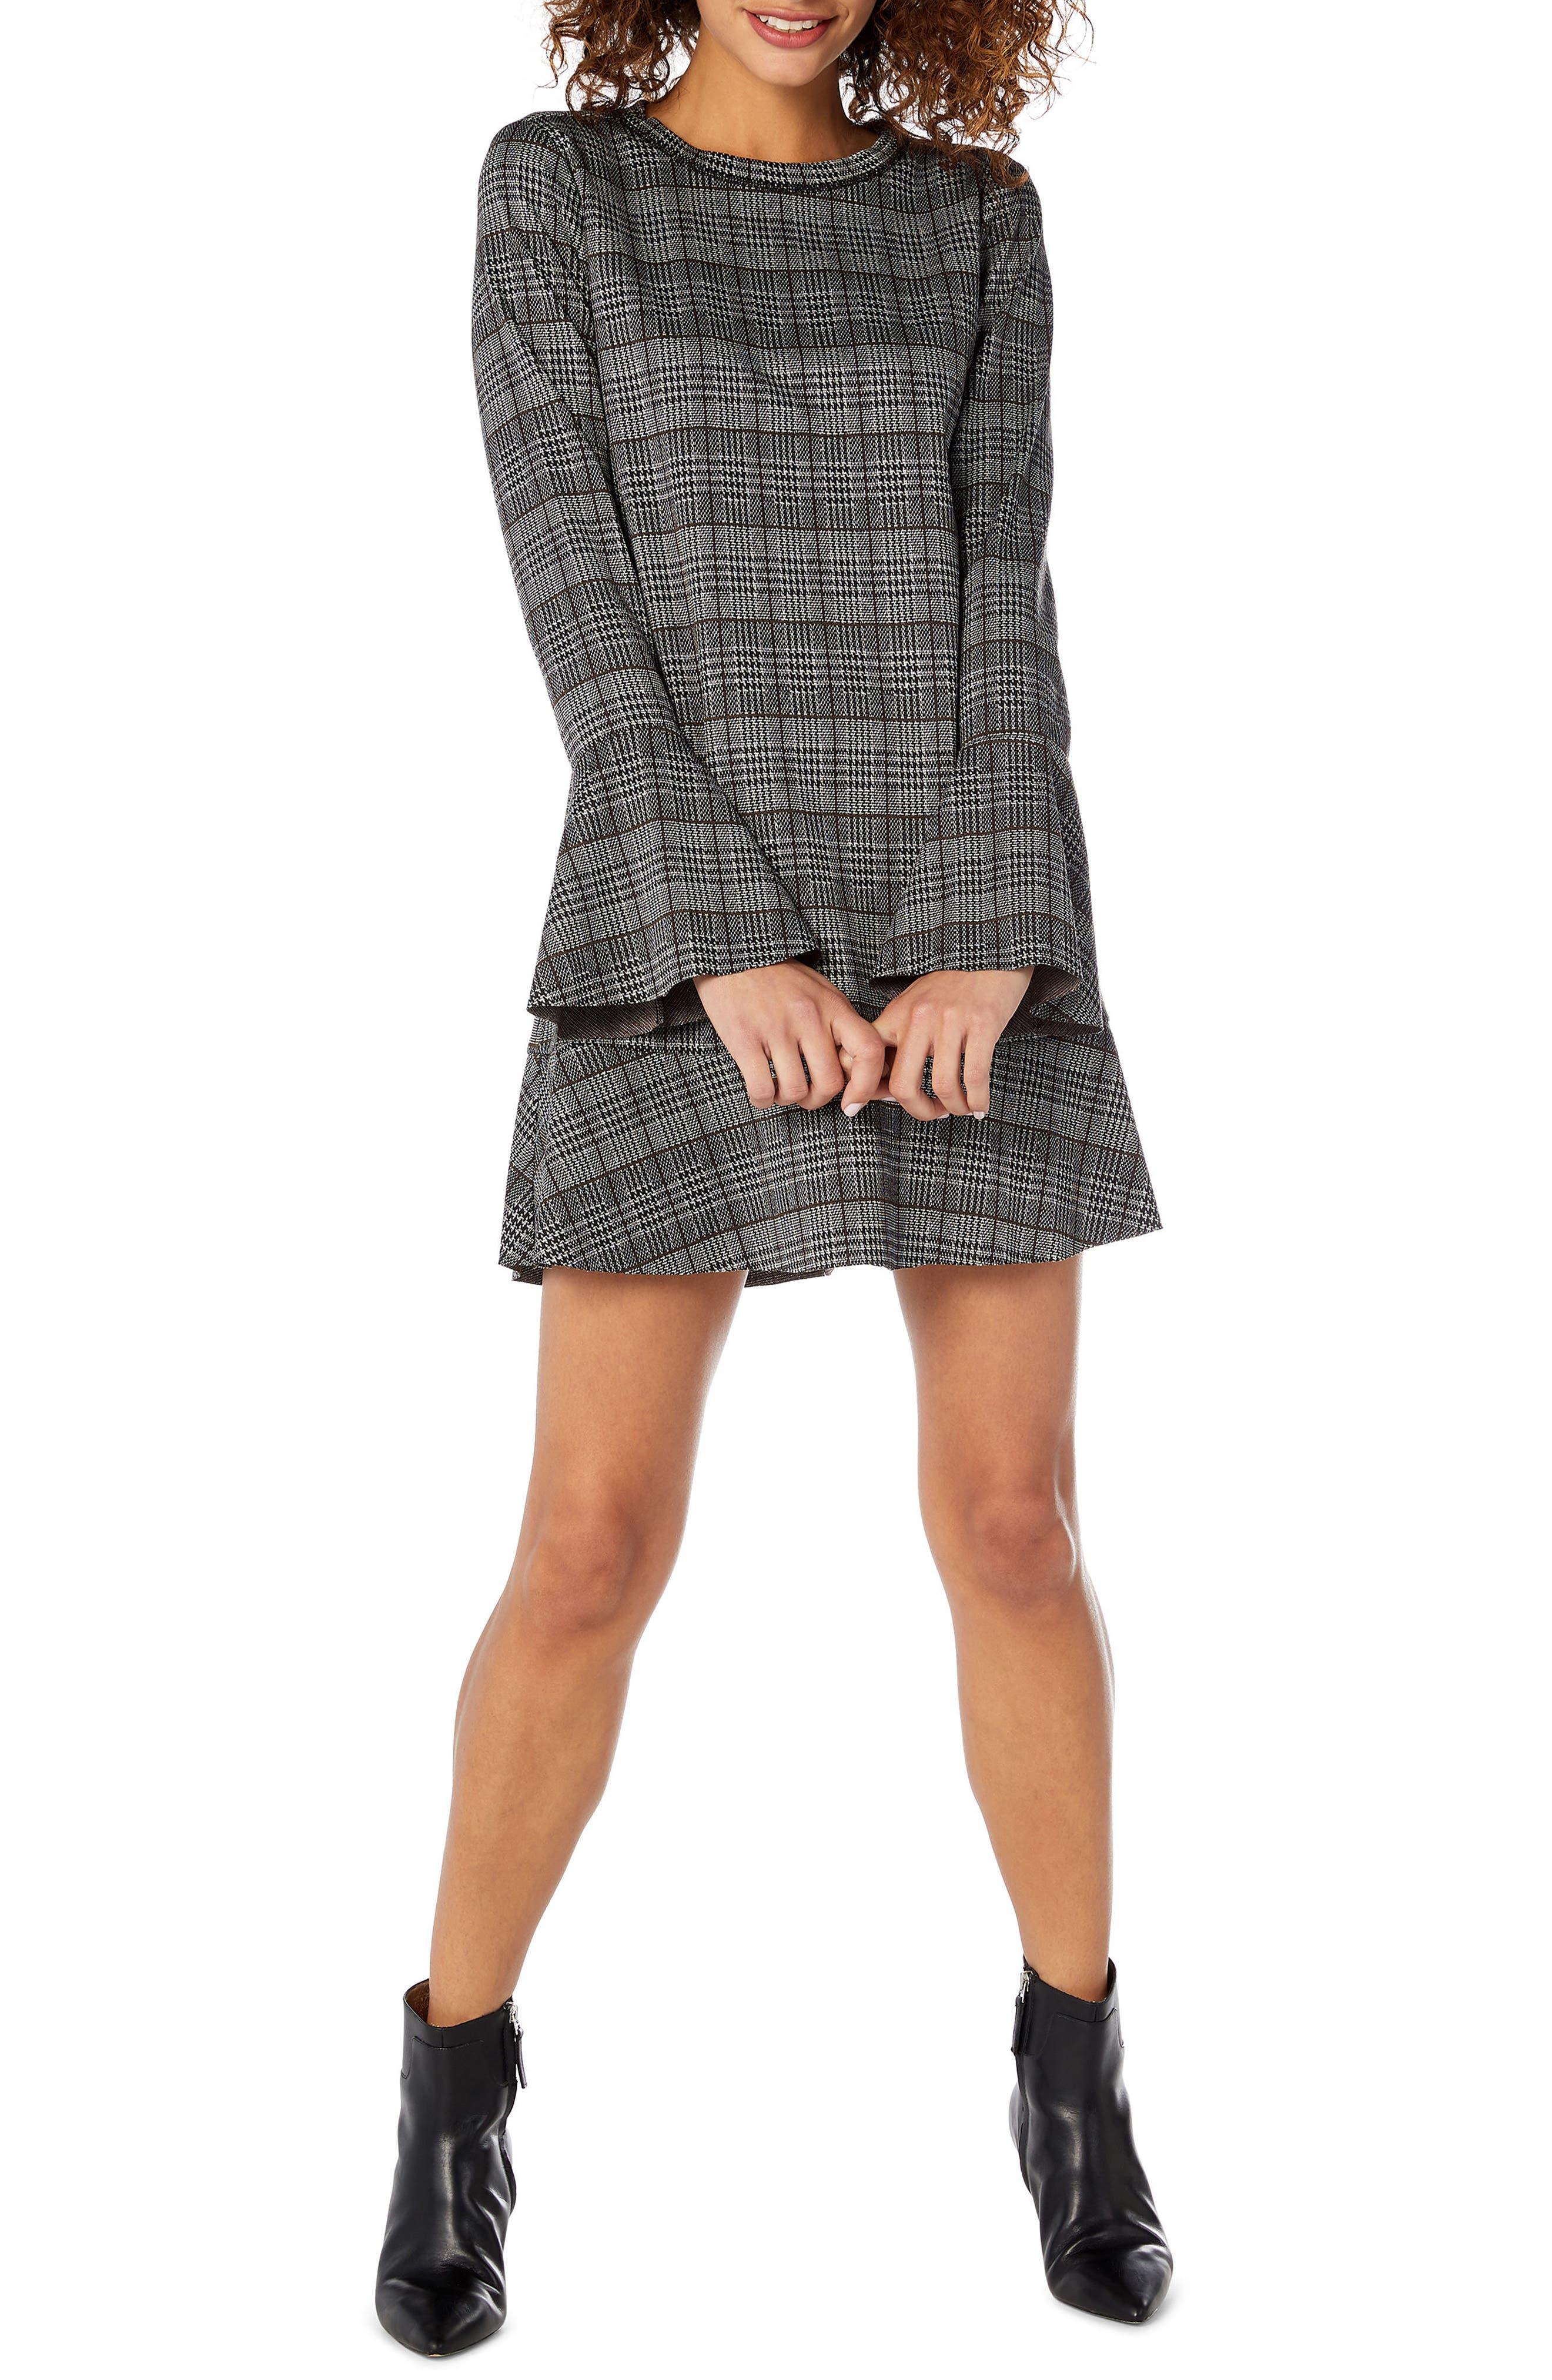 MICHAEL STARS Glen-Plaid Bell-Sleeve Dress